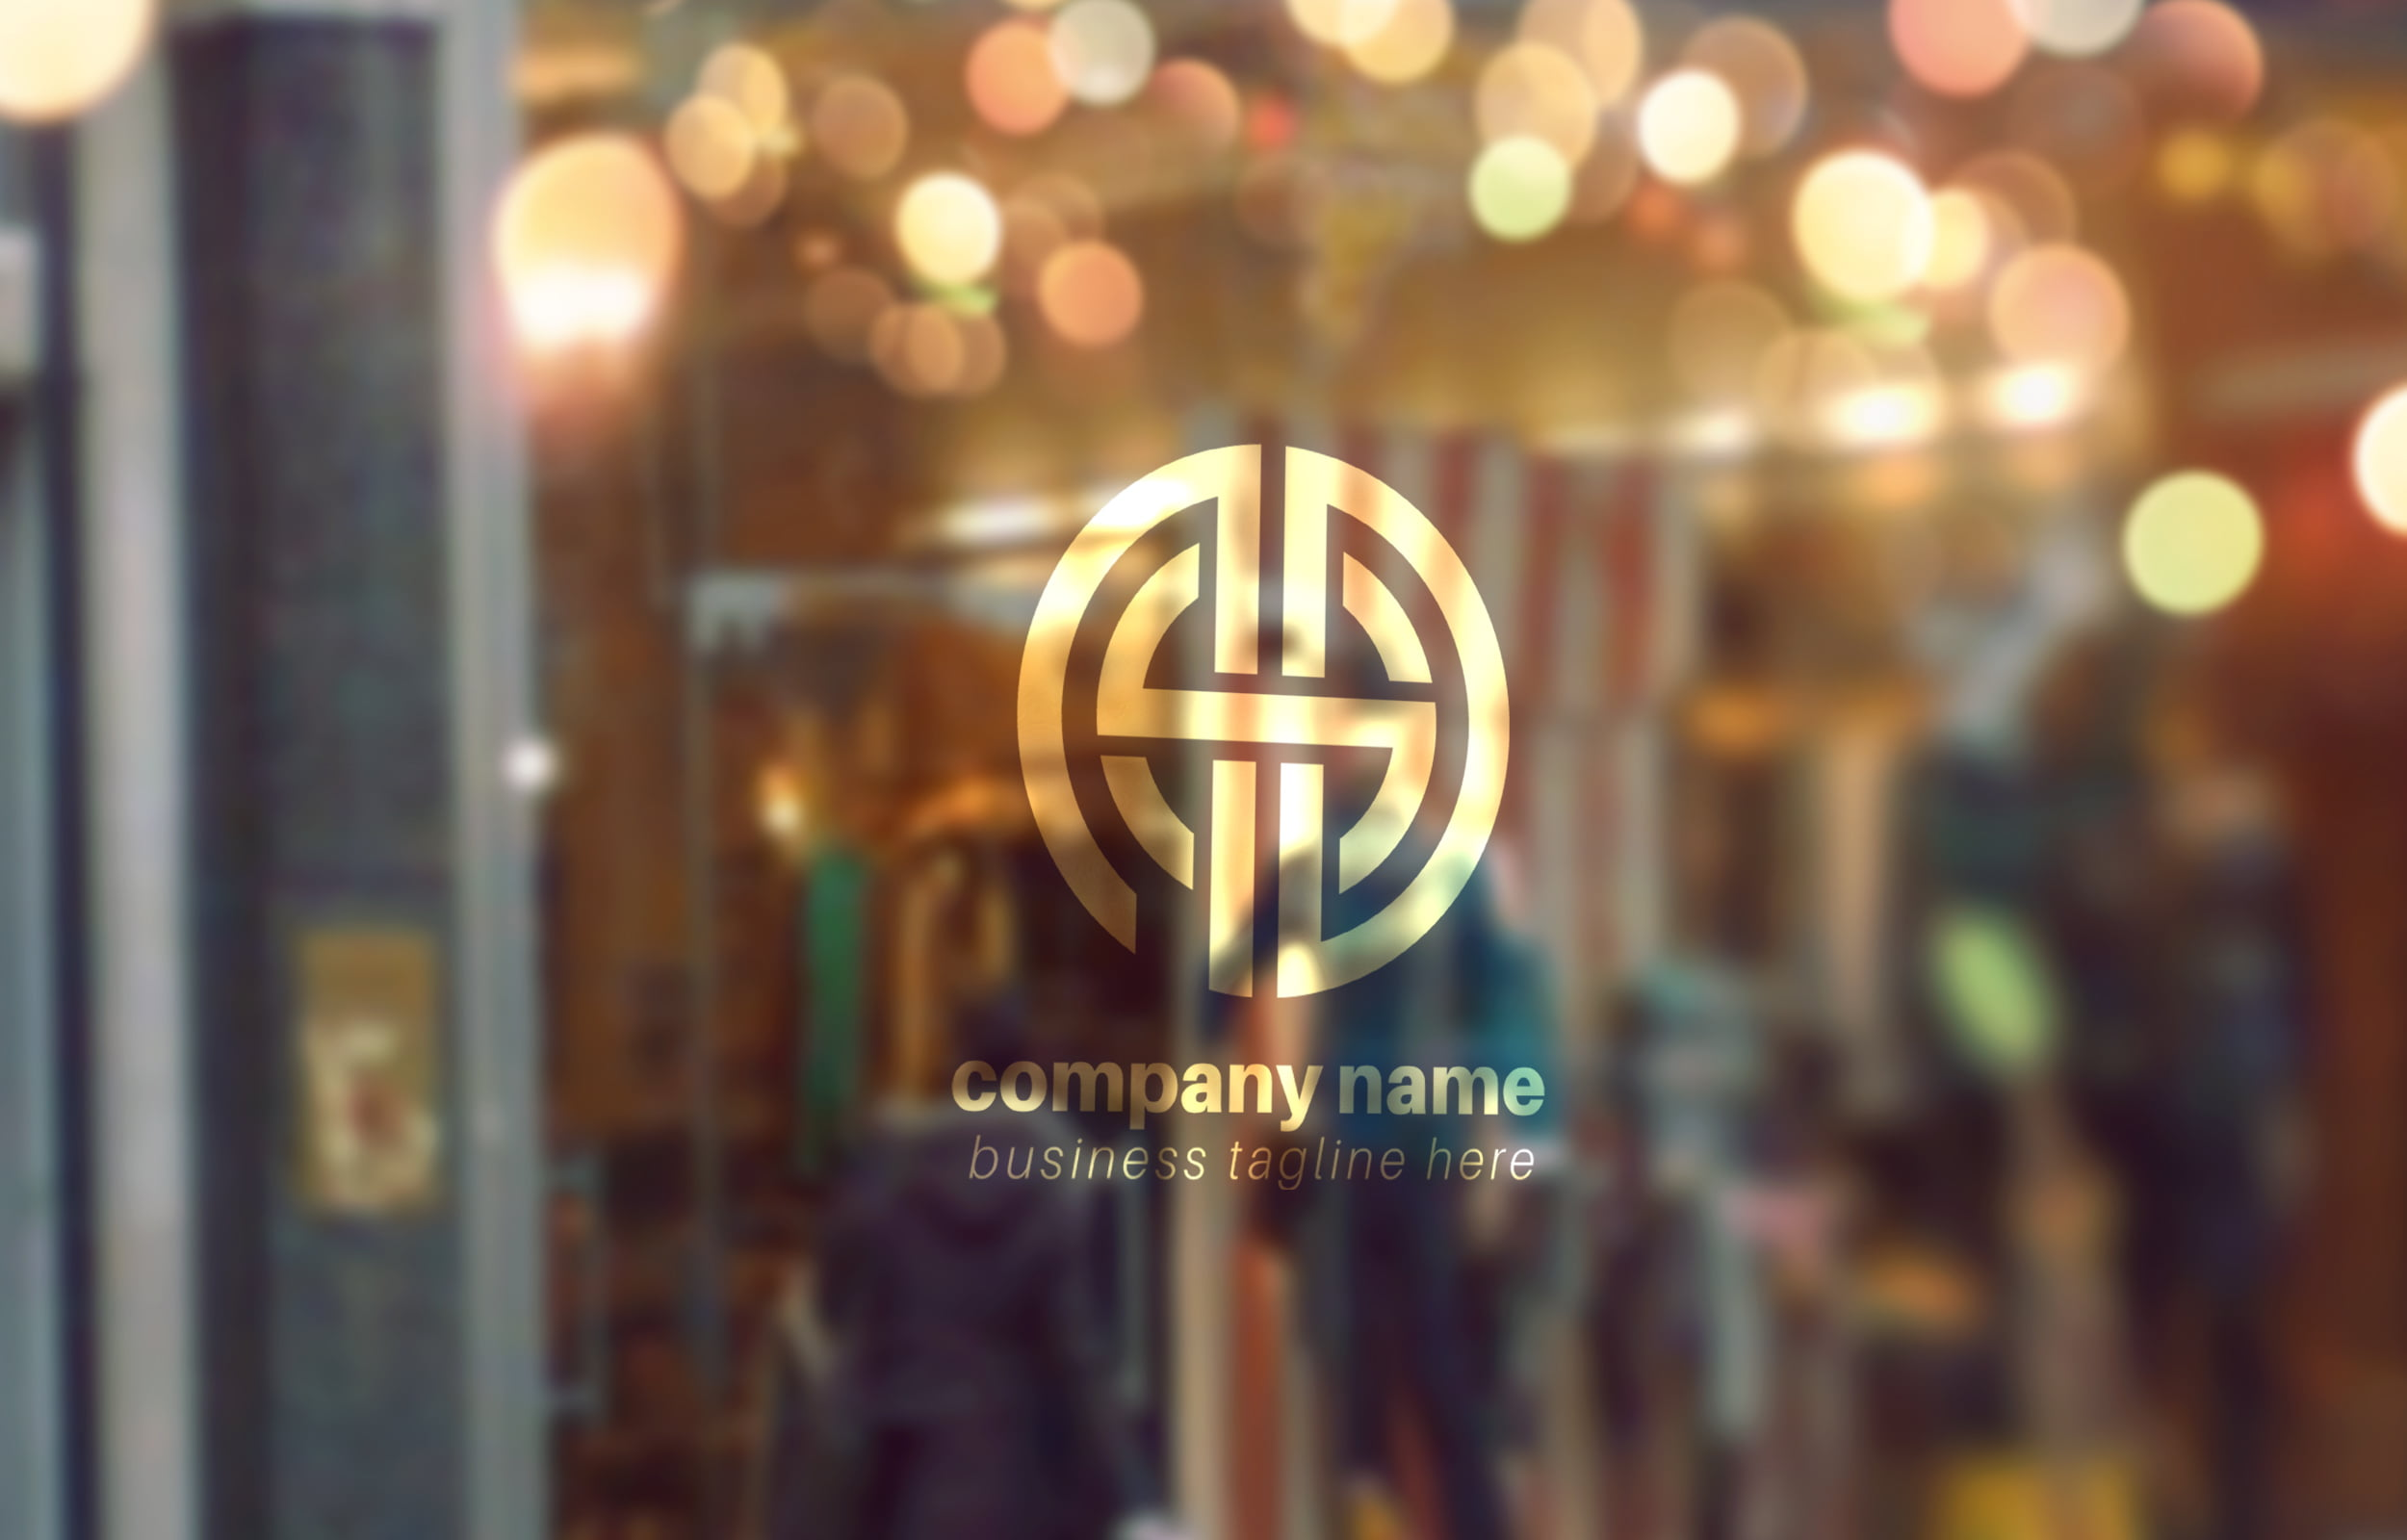 Free-Download-Creative-Typographic-Logo-Template